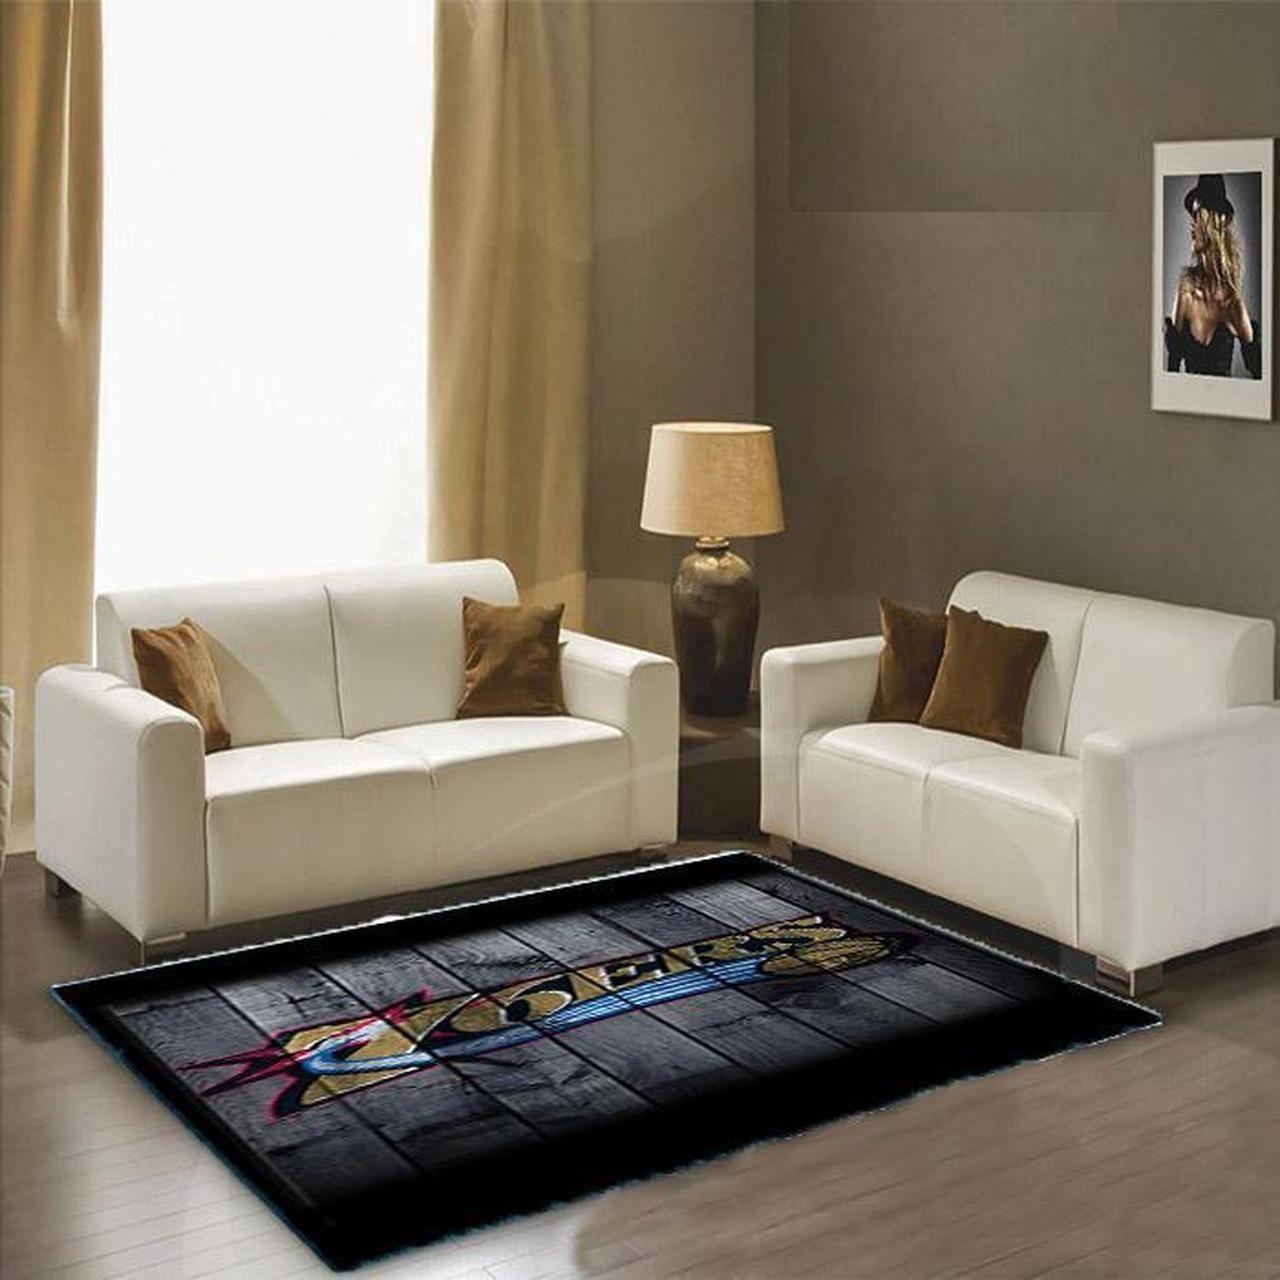 Amazon Philadelphia 76ers Living Room Area No4469 Rug